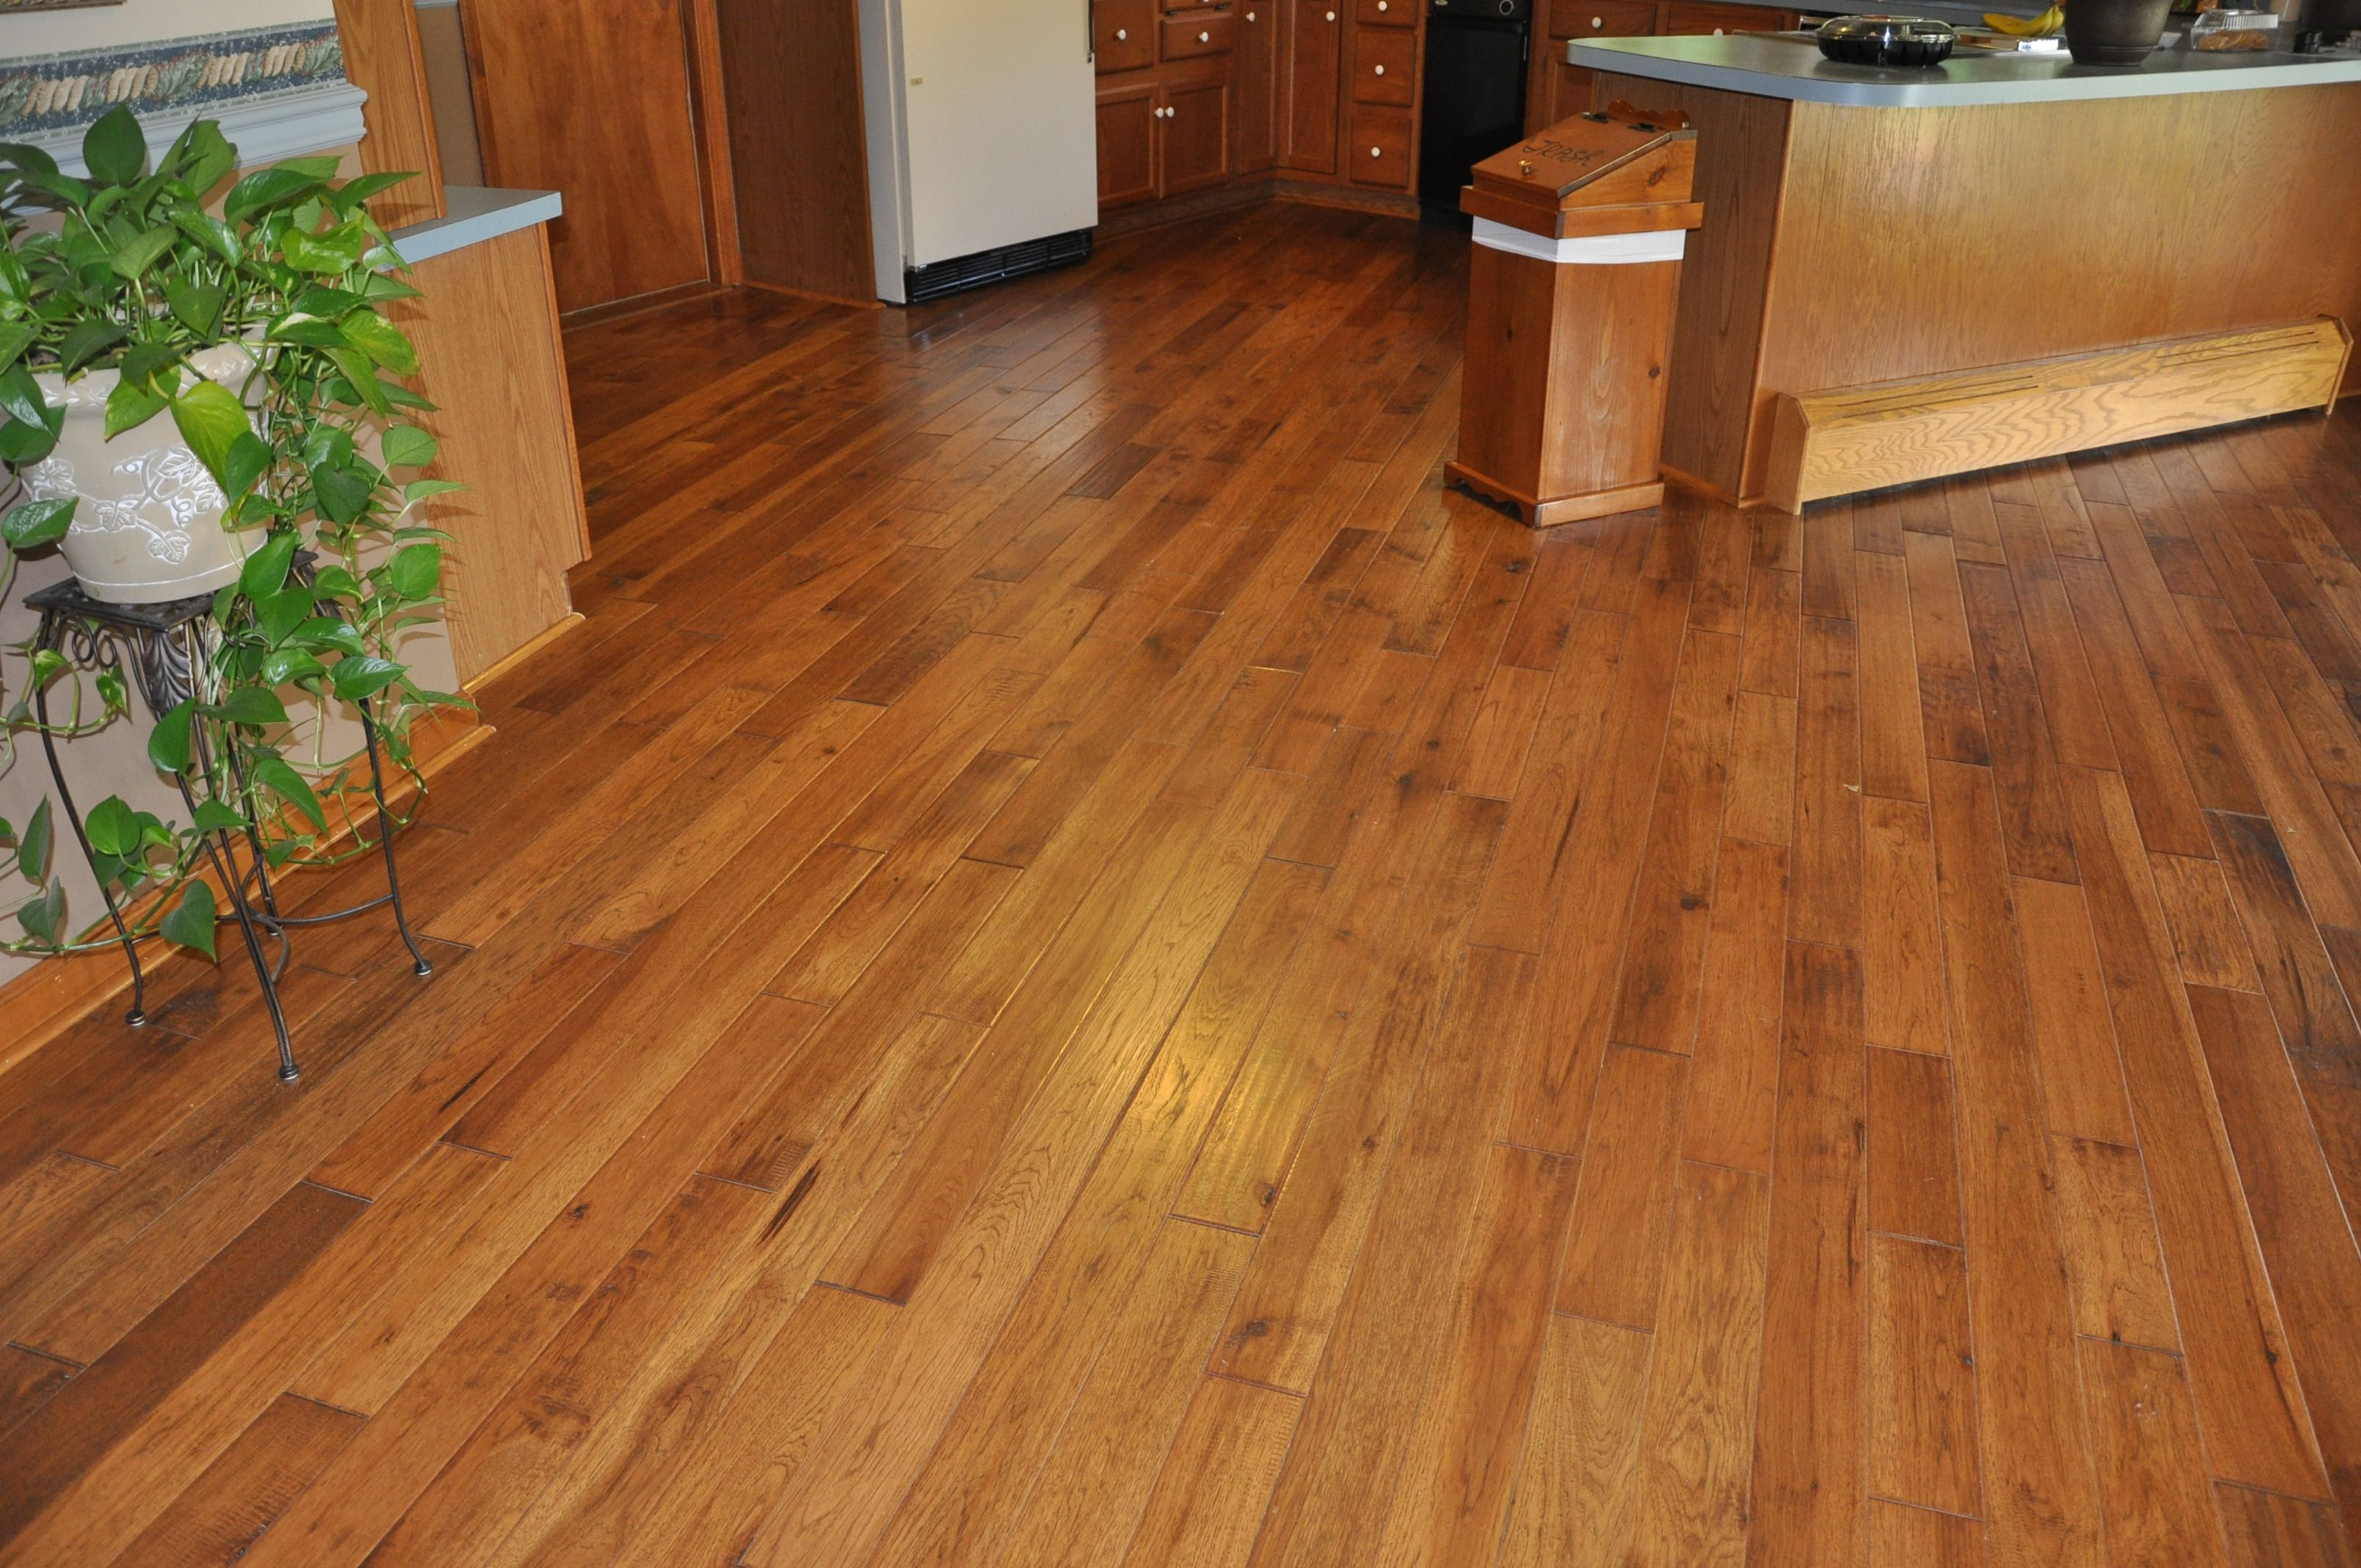 oiled natural handscraped scraped millennium floors hickory uv flooring hardwood hand